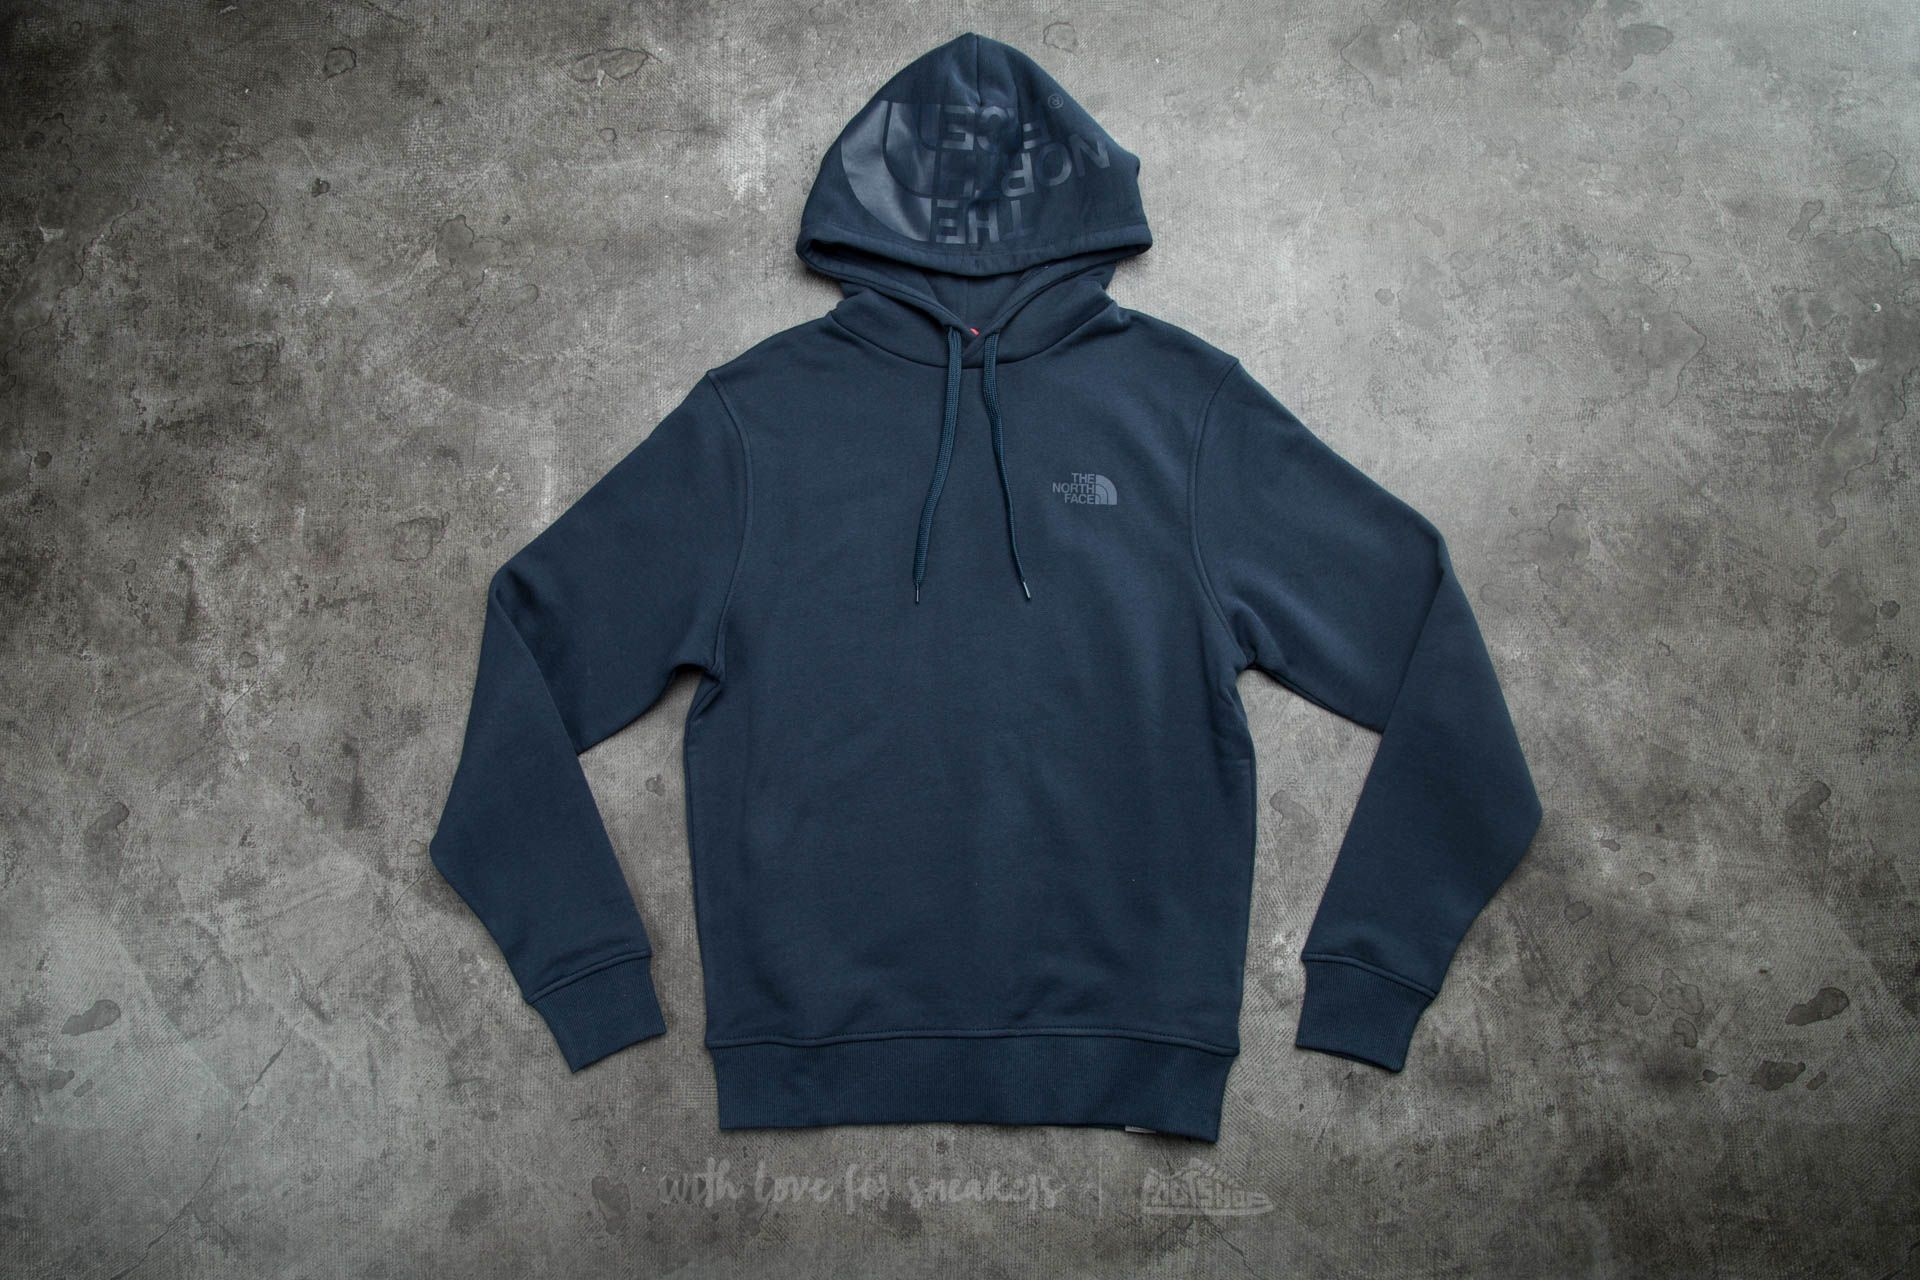 832709f6f6a ... usa the north face m seasonal drew peak pullover hoodie urban navy  68efc 4a1b9 ...